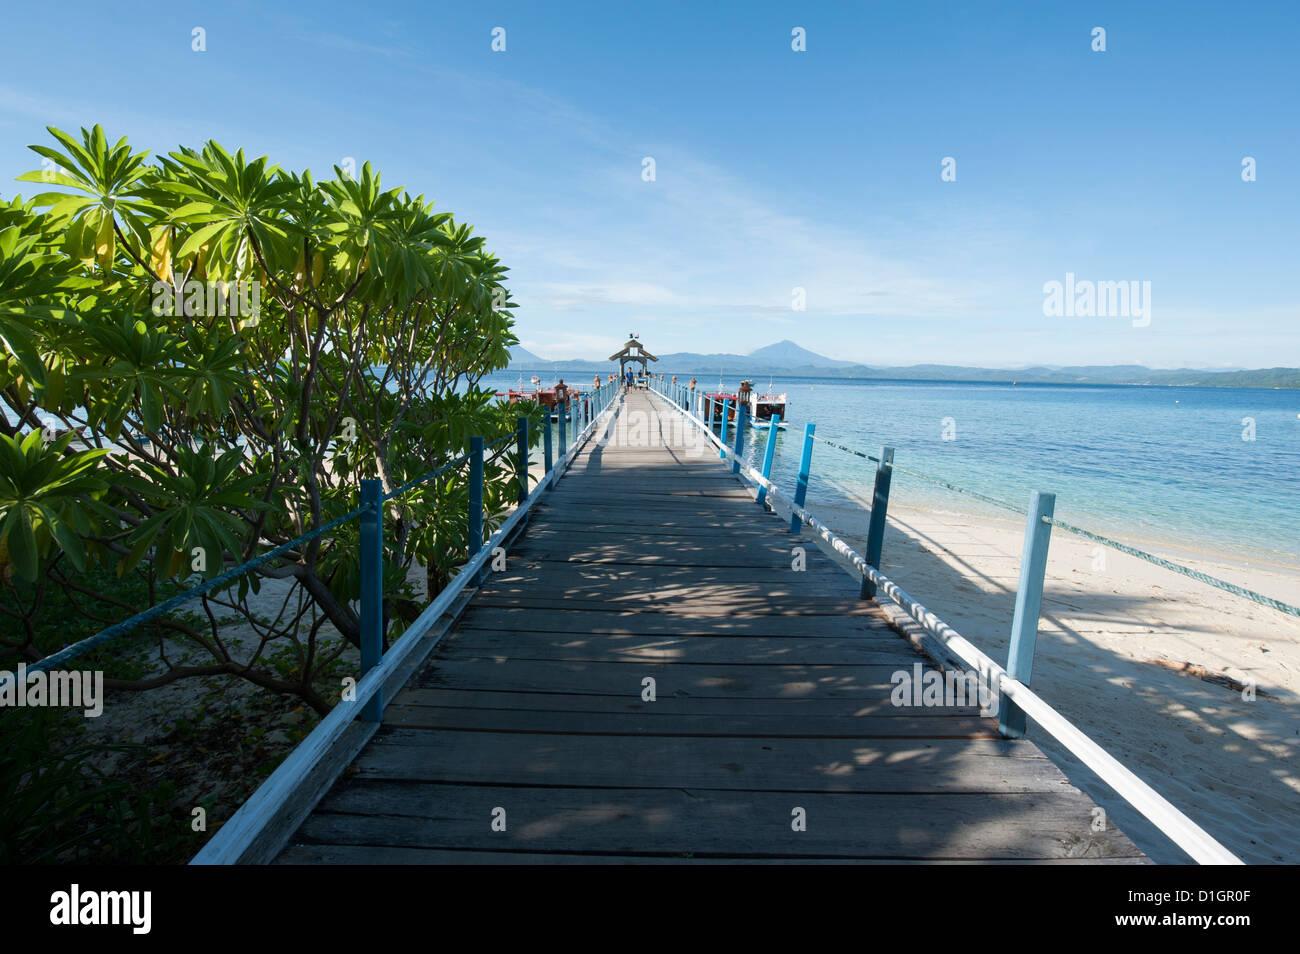 Jetty at Gangga Island, Sulawesi, Indonesia, Southeast Asia, Asia - Stock Image